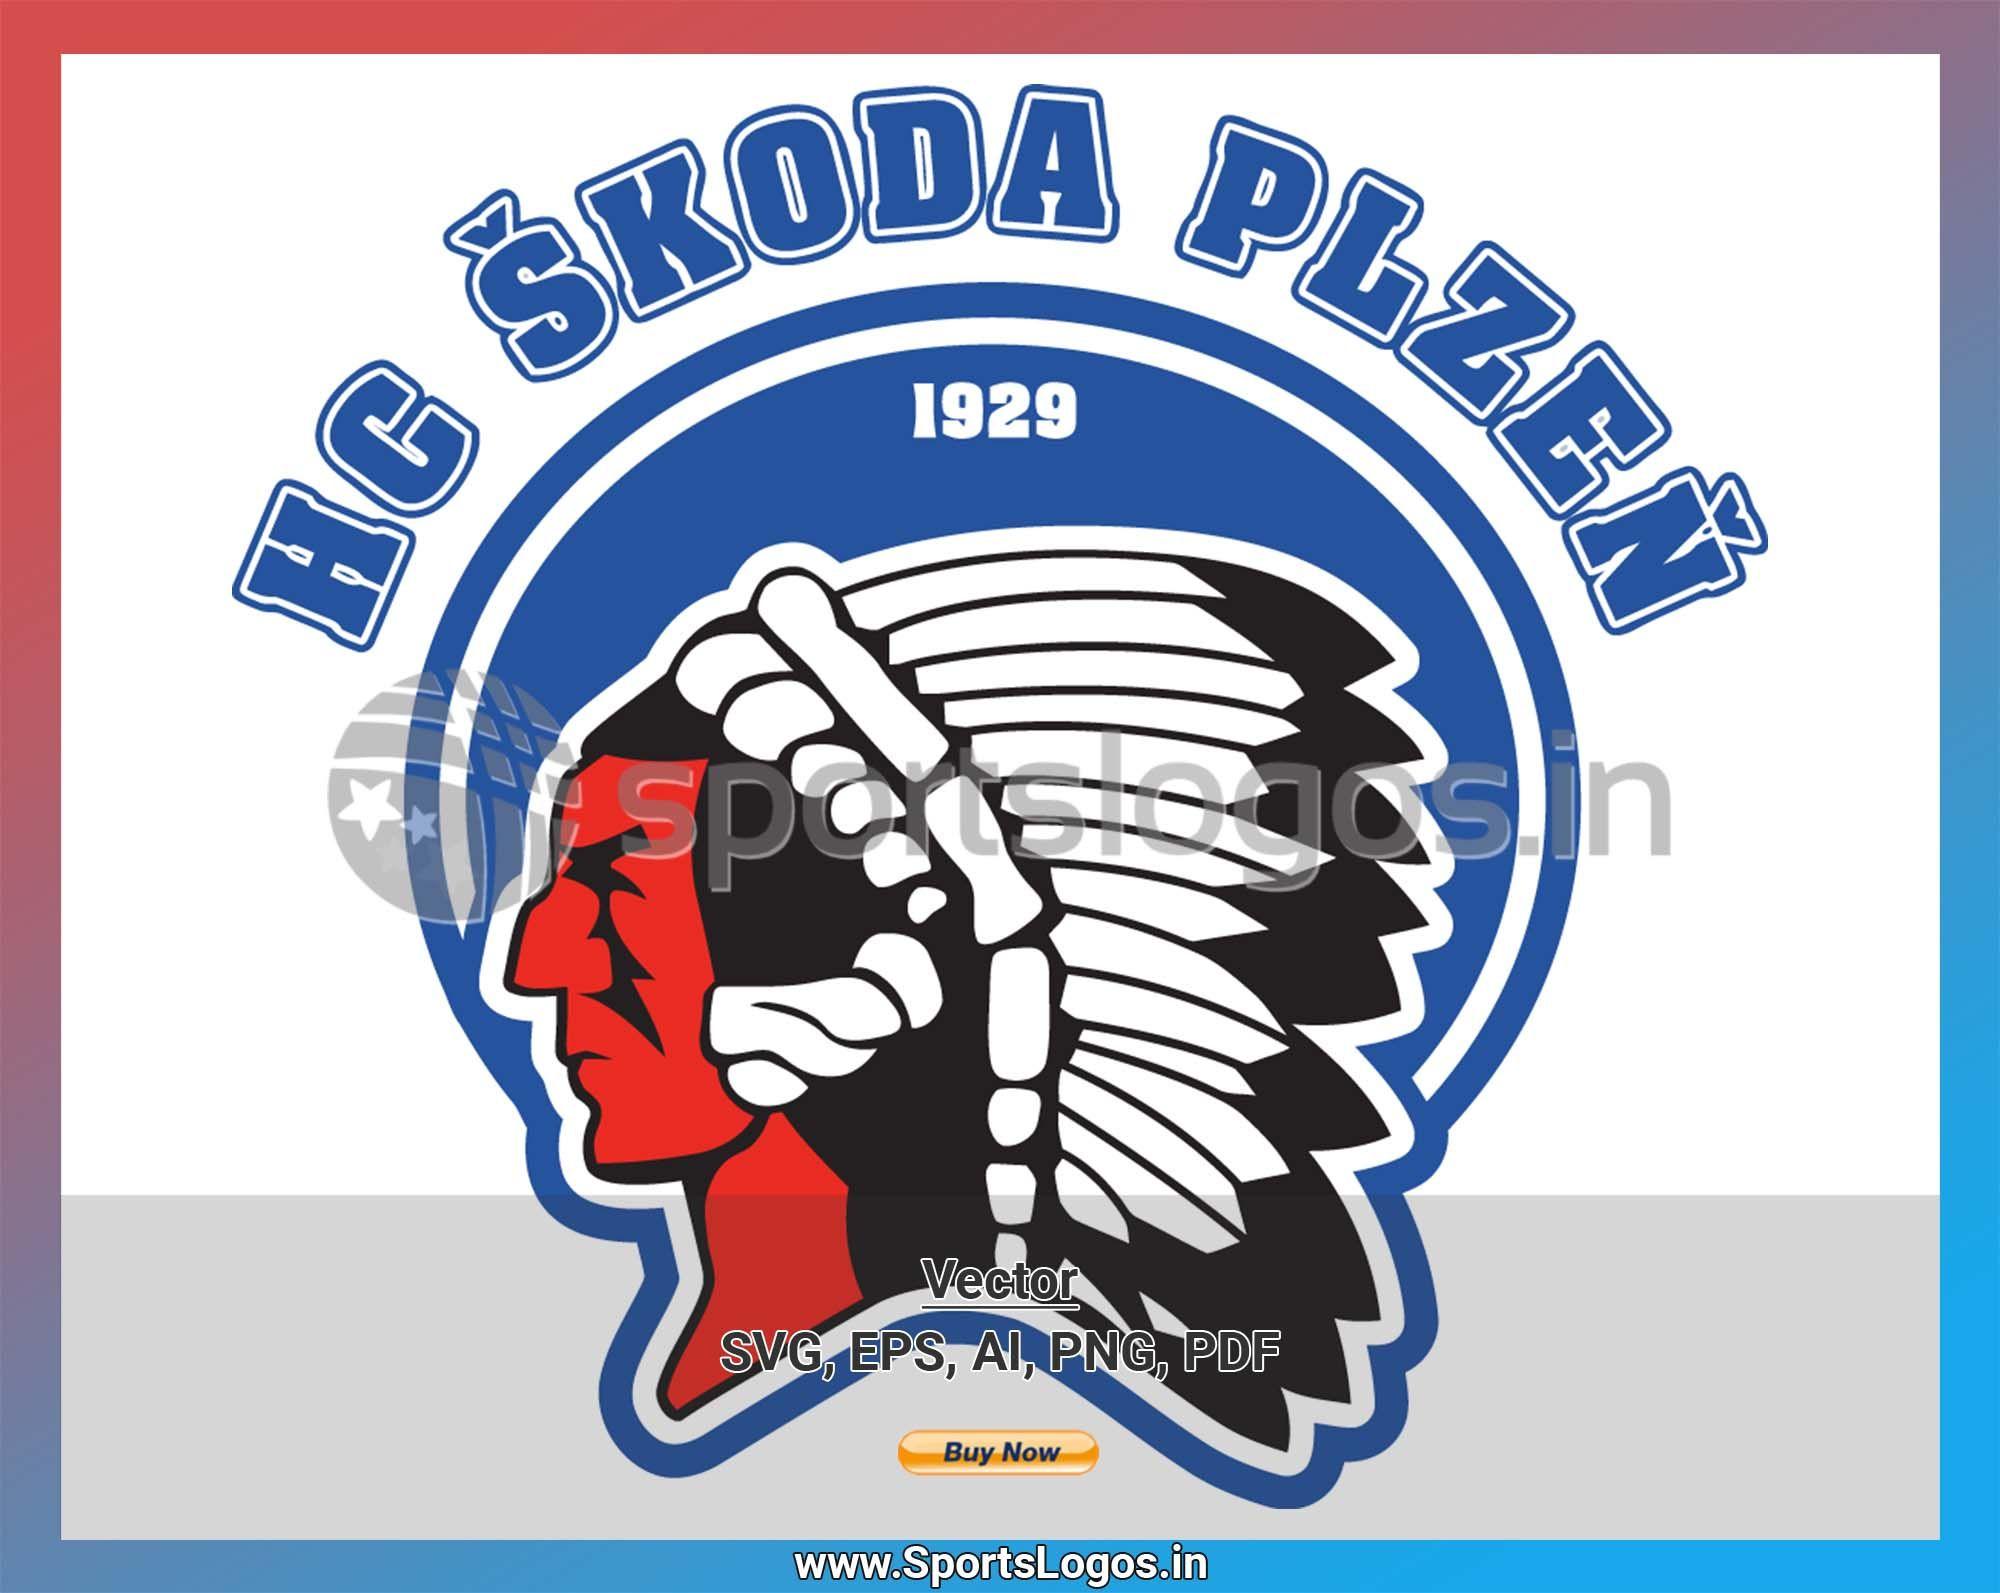 HC Skoda Plzen 2011/12, Extraliga ledního hokeje, ELH